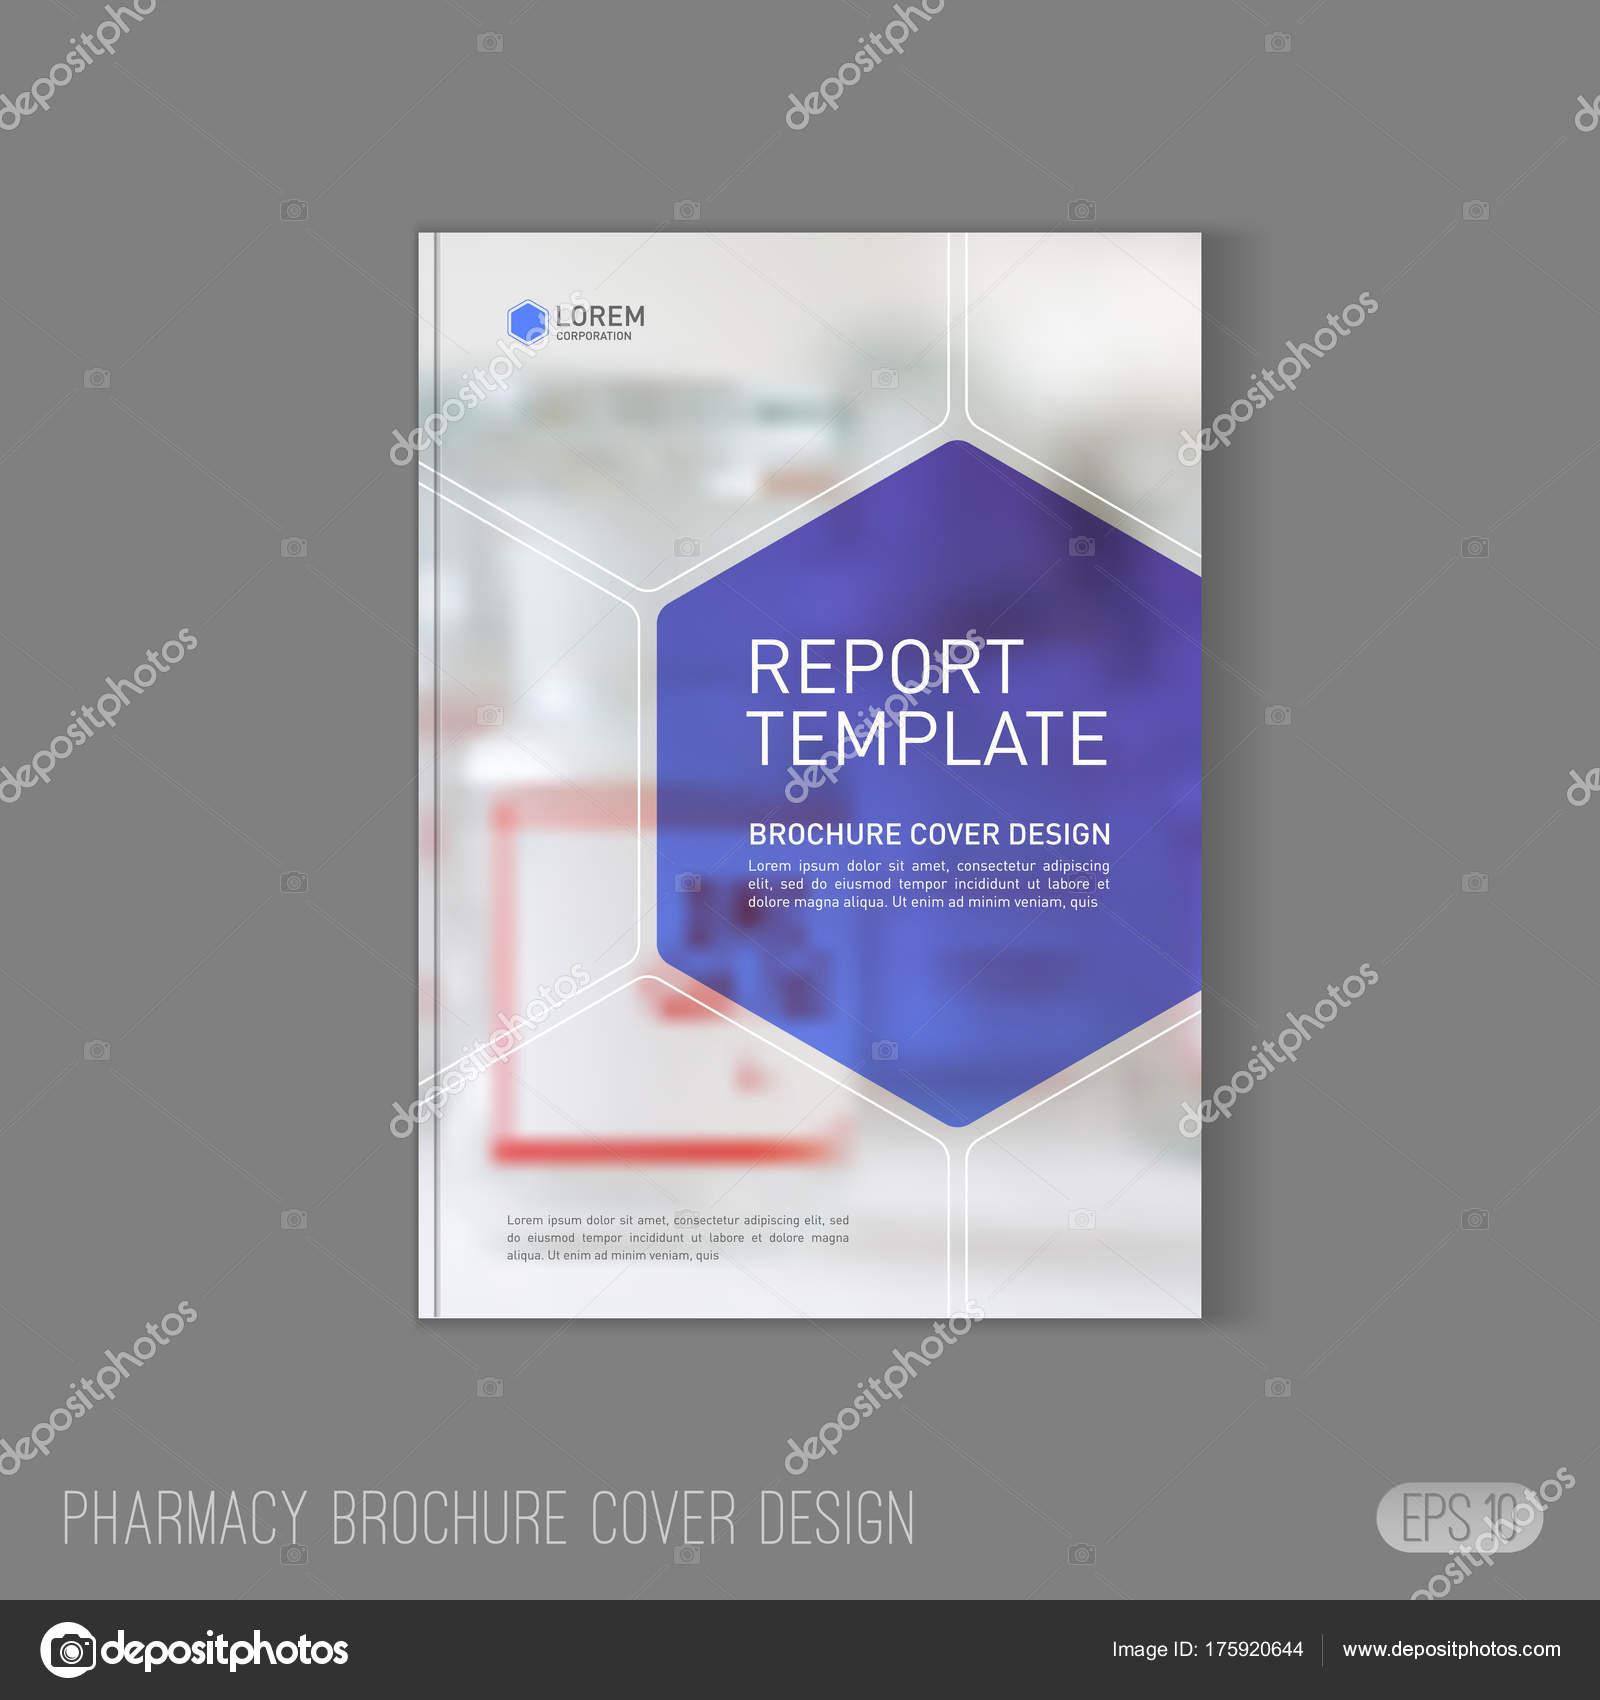 pharmacy brochure template free.html